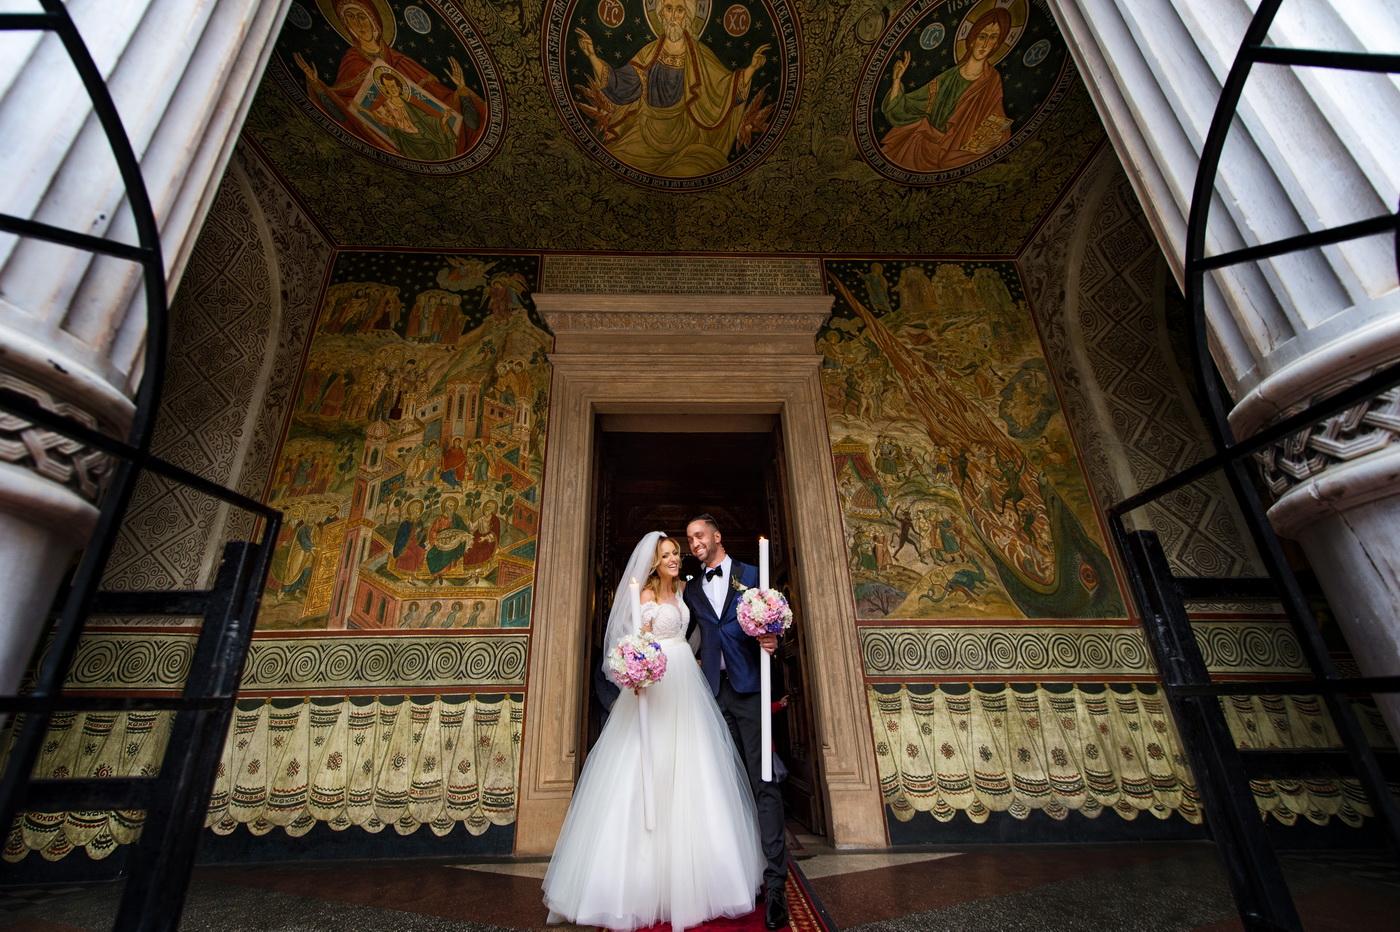 Destination Wedding Photographer_Marian Sterea_185.jpg